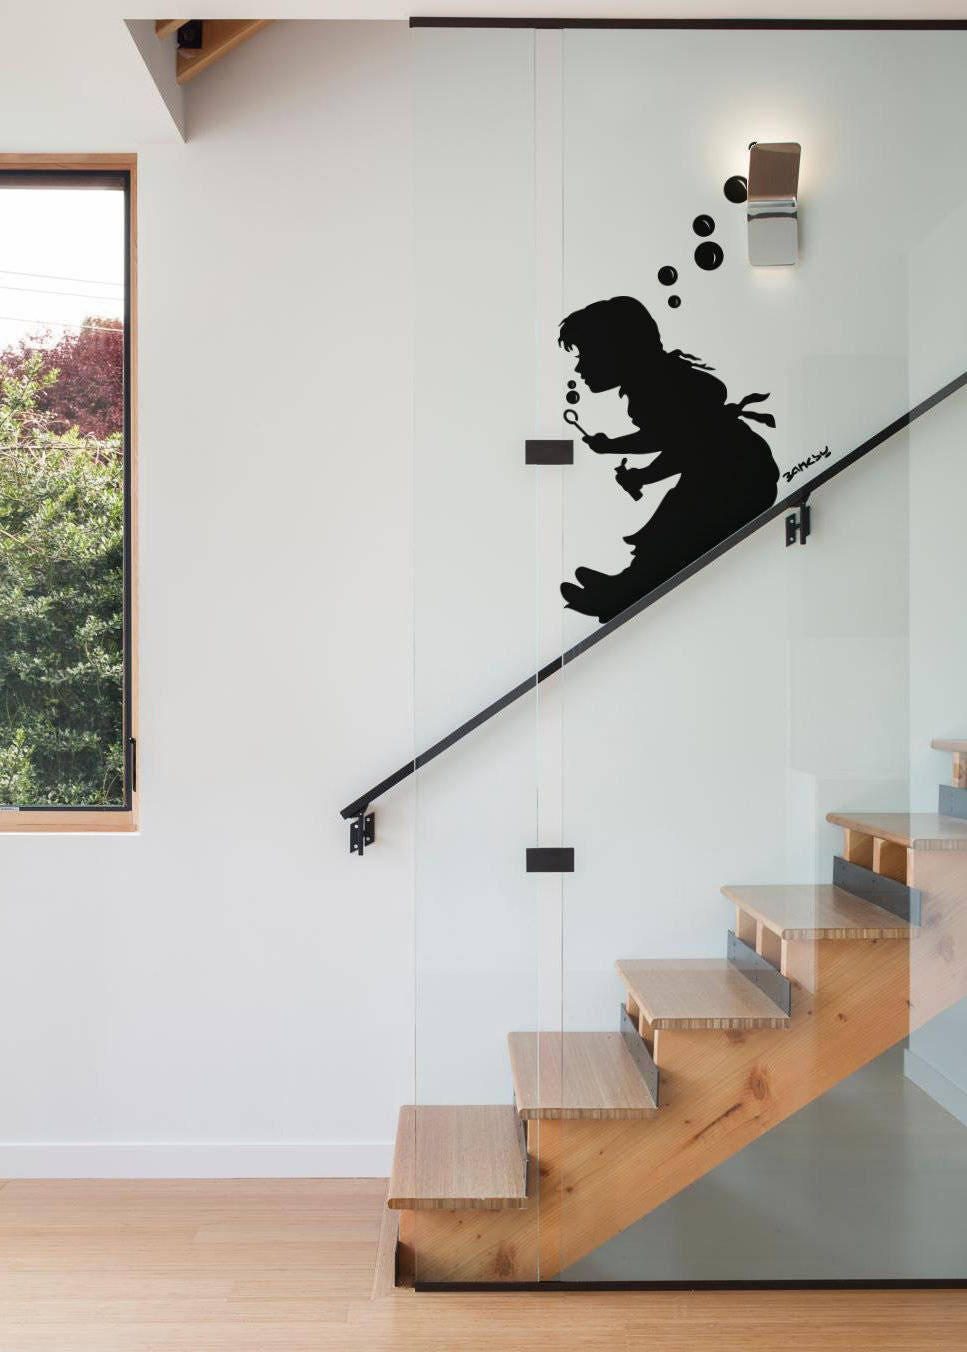 Bubble Girl Slide, Banksy, Wall Decal Sticker, Banksy Style, Urban Art,  Artist Graffiti Stencil Urban Walls Wallart Spray, Wall Art, London